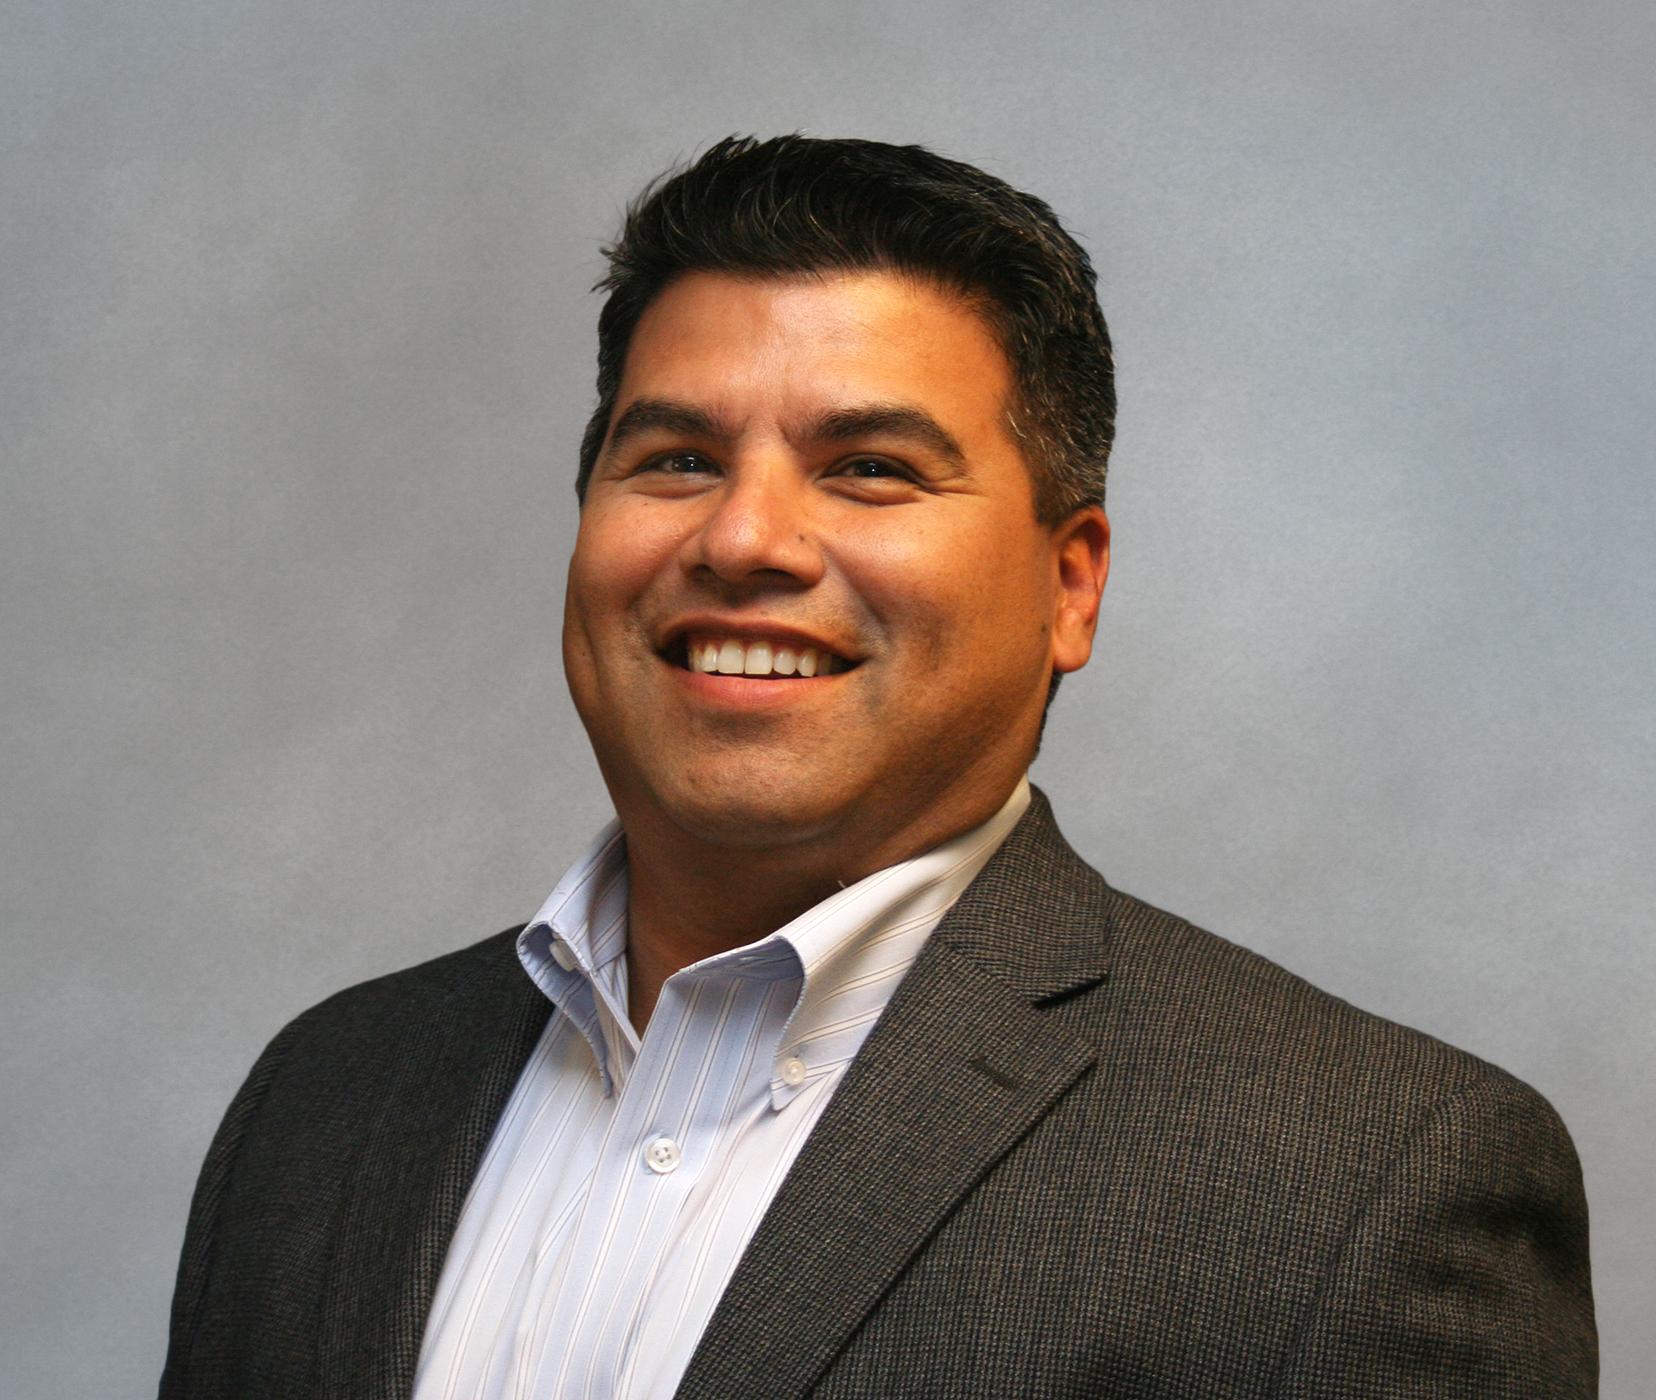 Michael Rivas